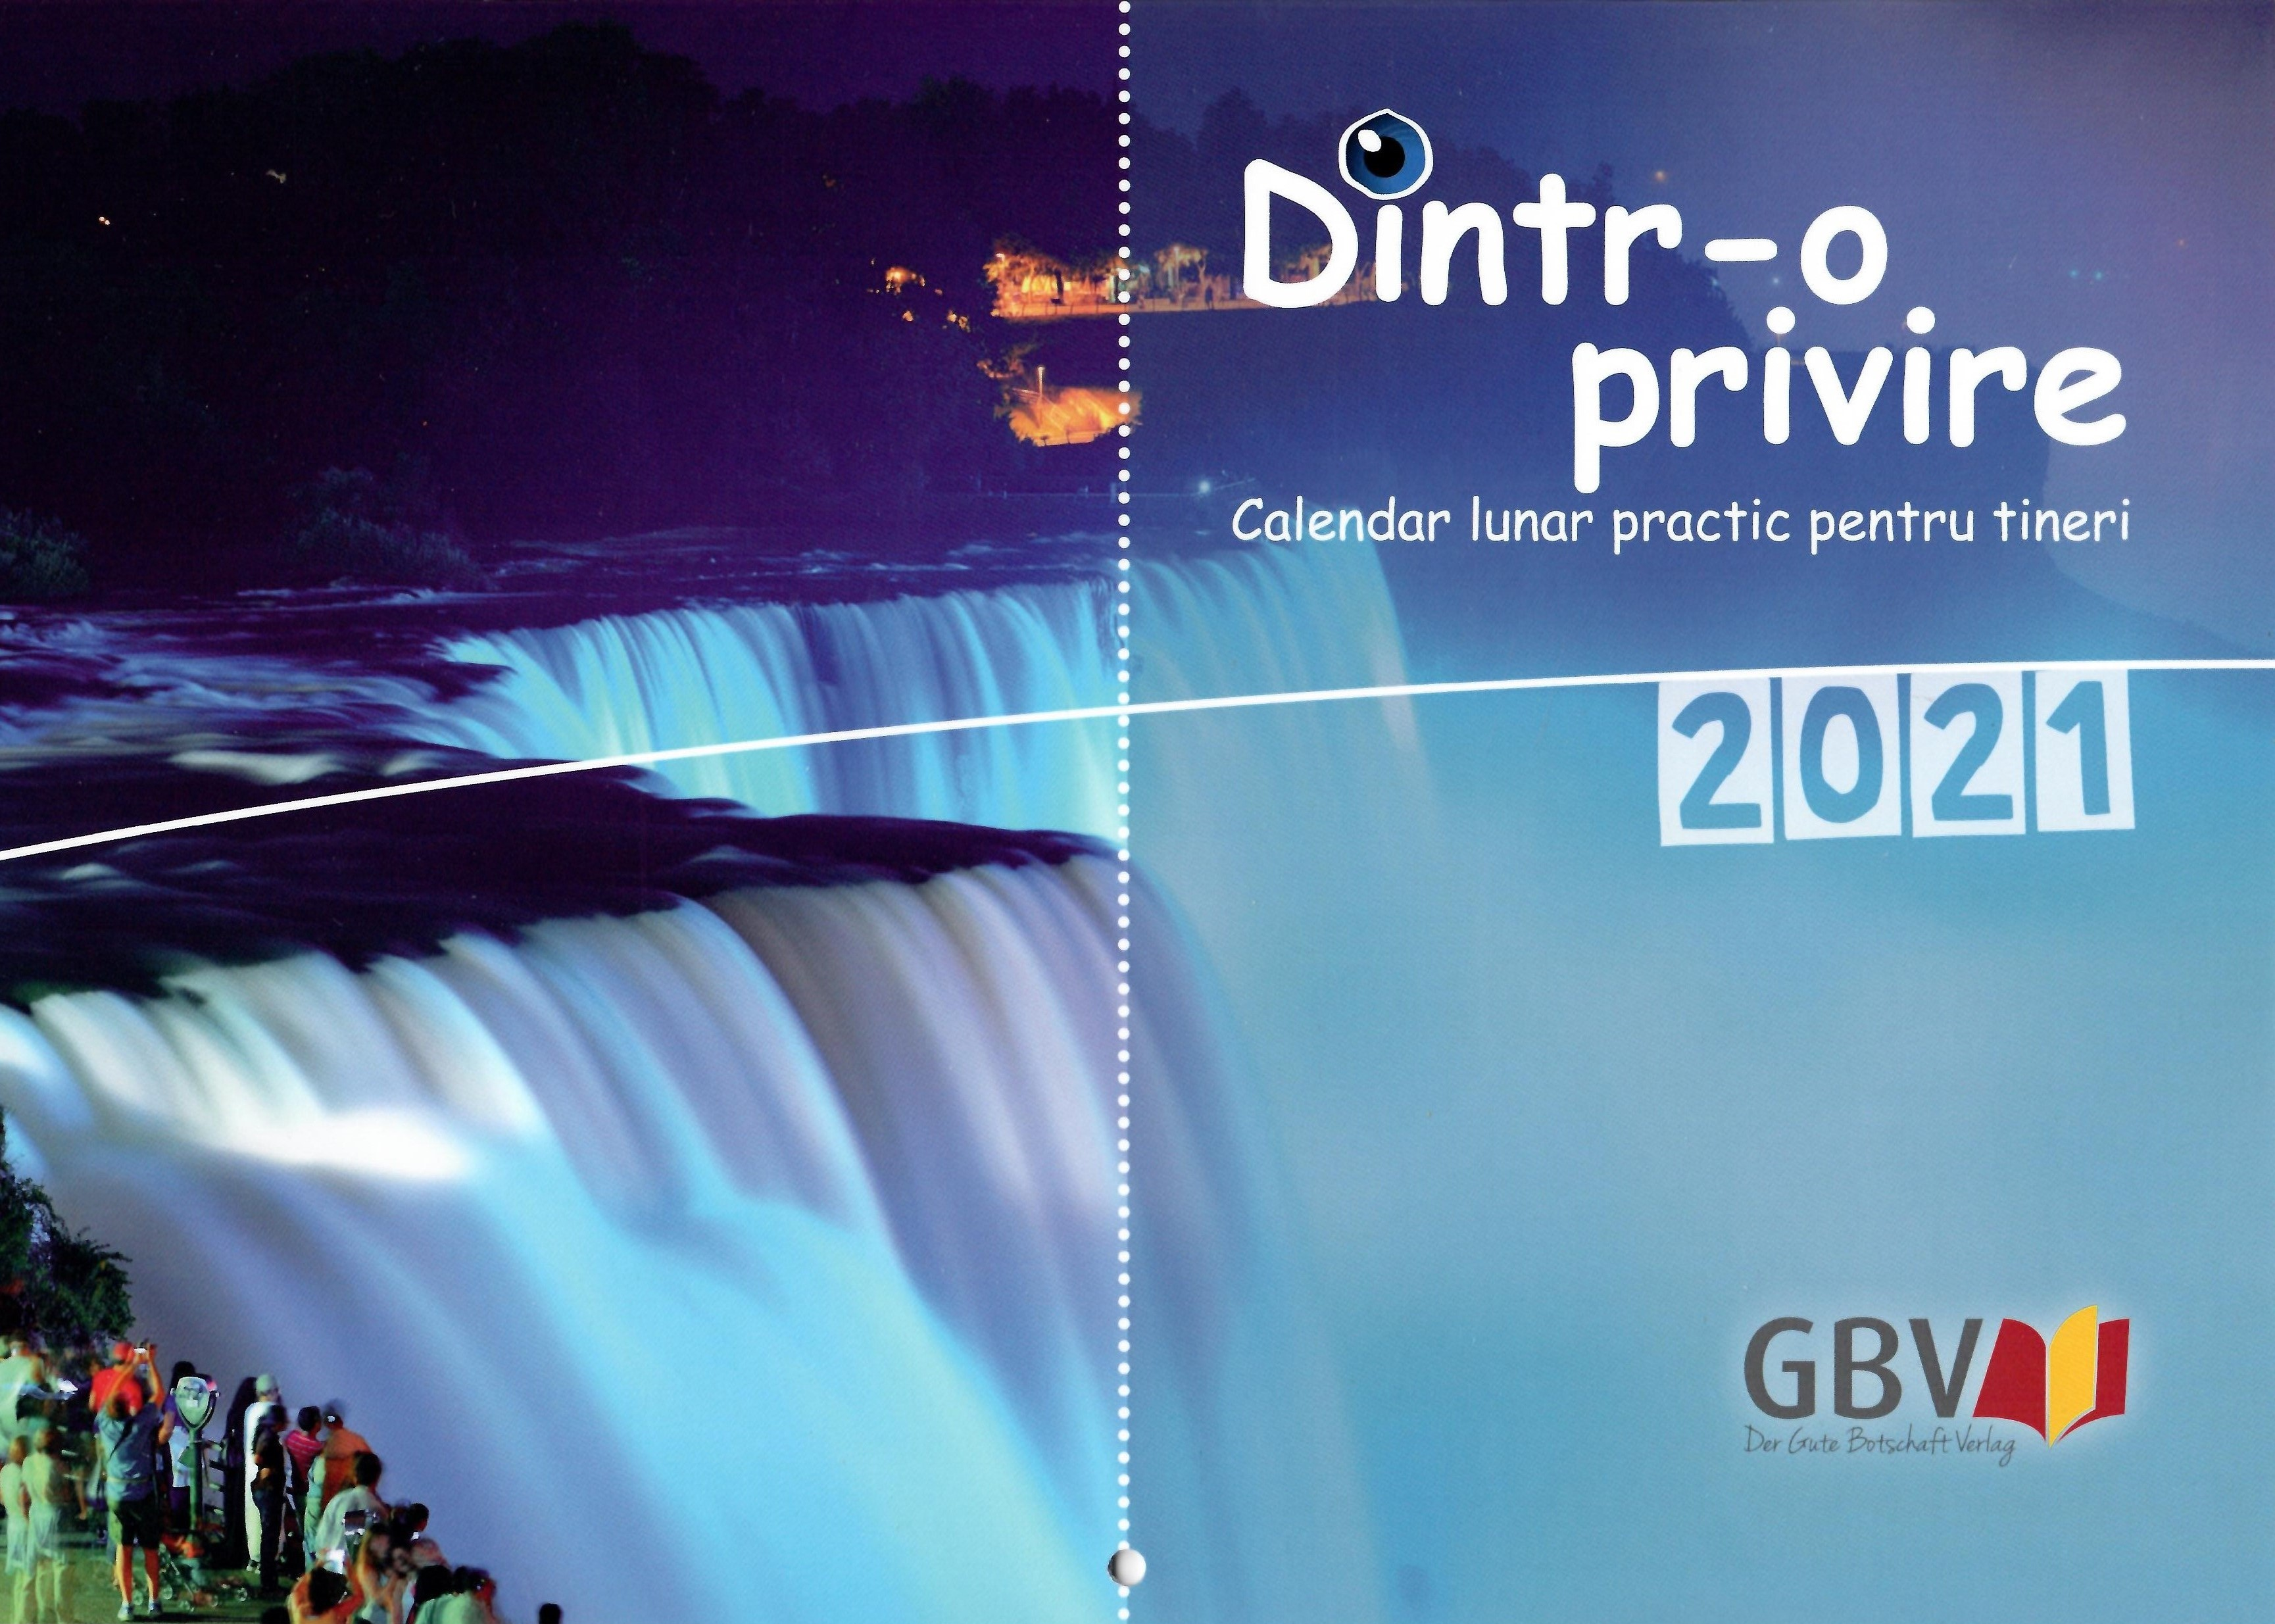 Calendar 2021 Dintr-o privire A4, pentru tineri